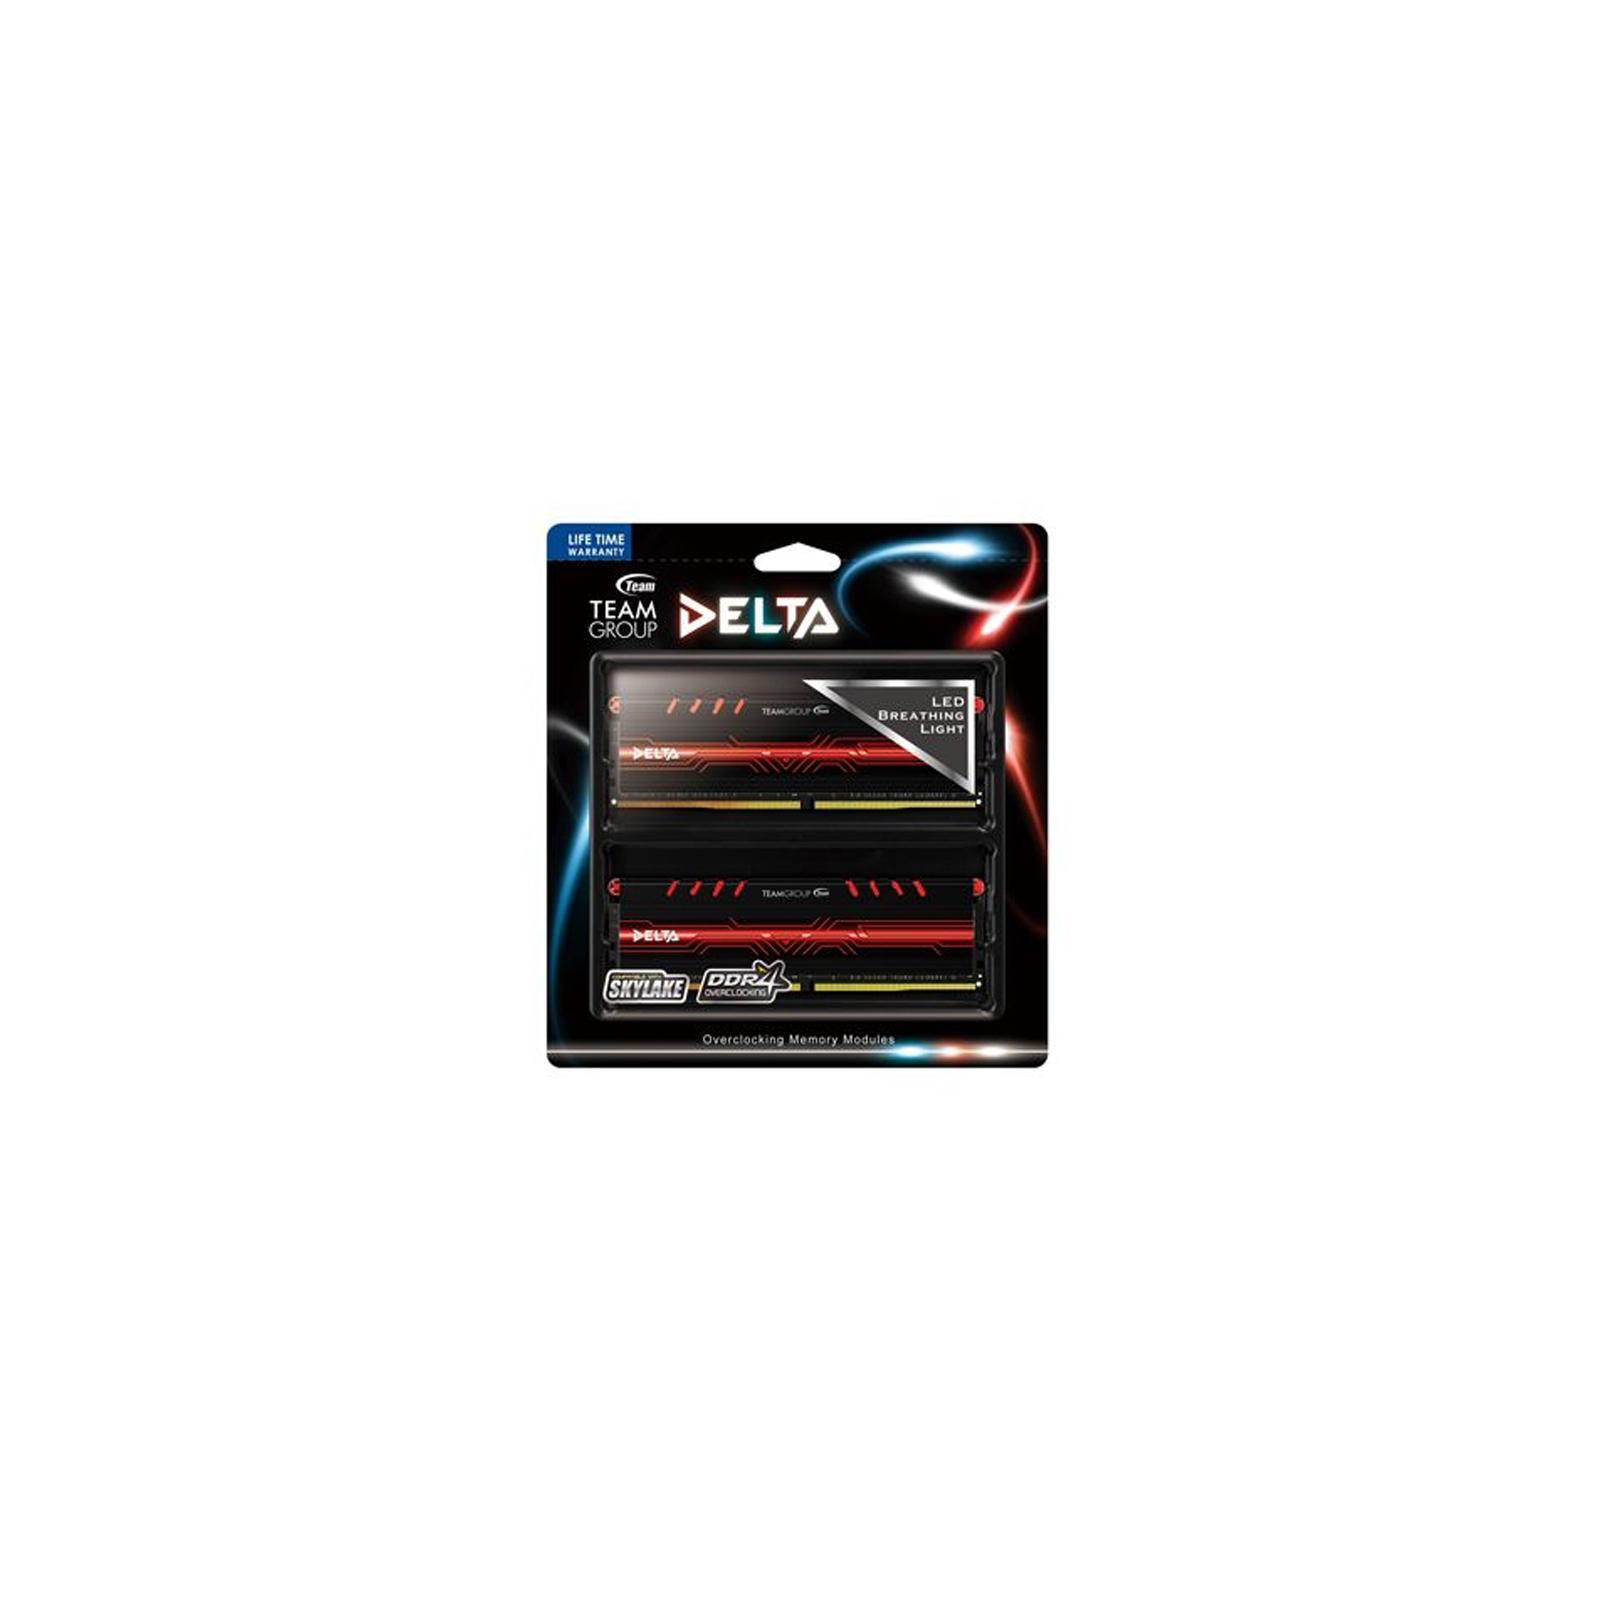 Модуль памяти для компьютера DDR4 16GB (2x8GB) 2400 MHz Delta Red LED Team (TDTRD416G2400HC15ADC01) изображение 3